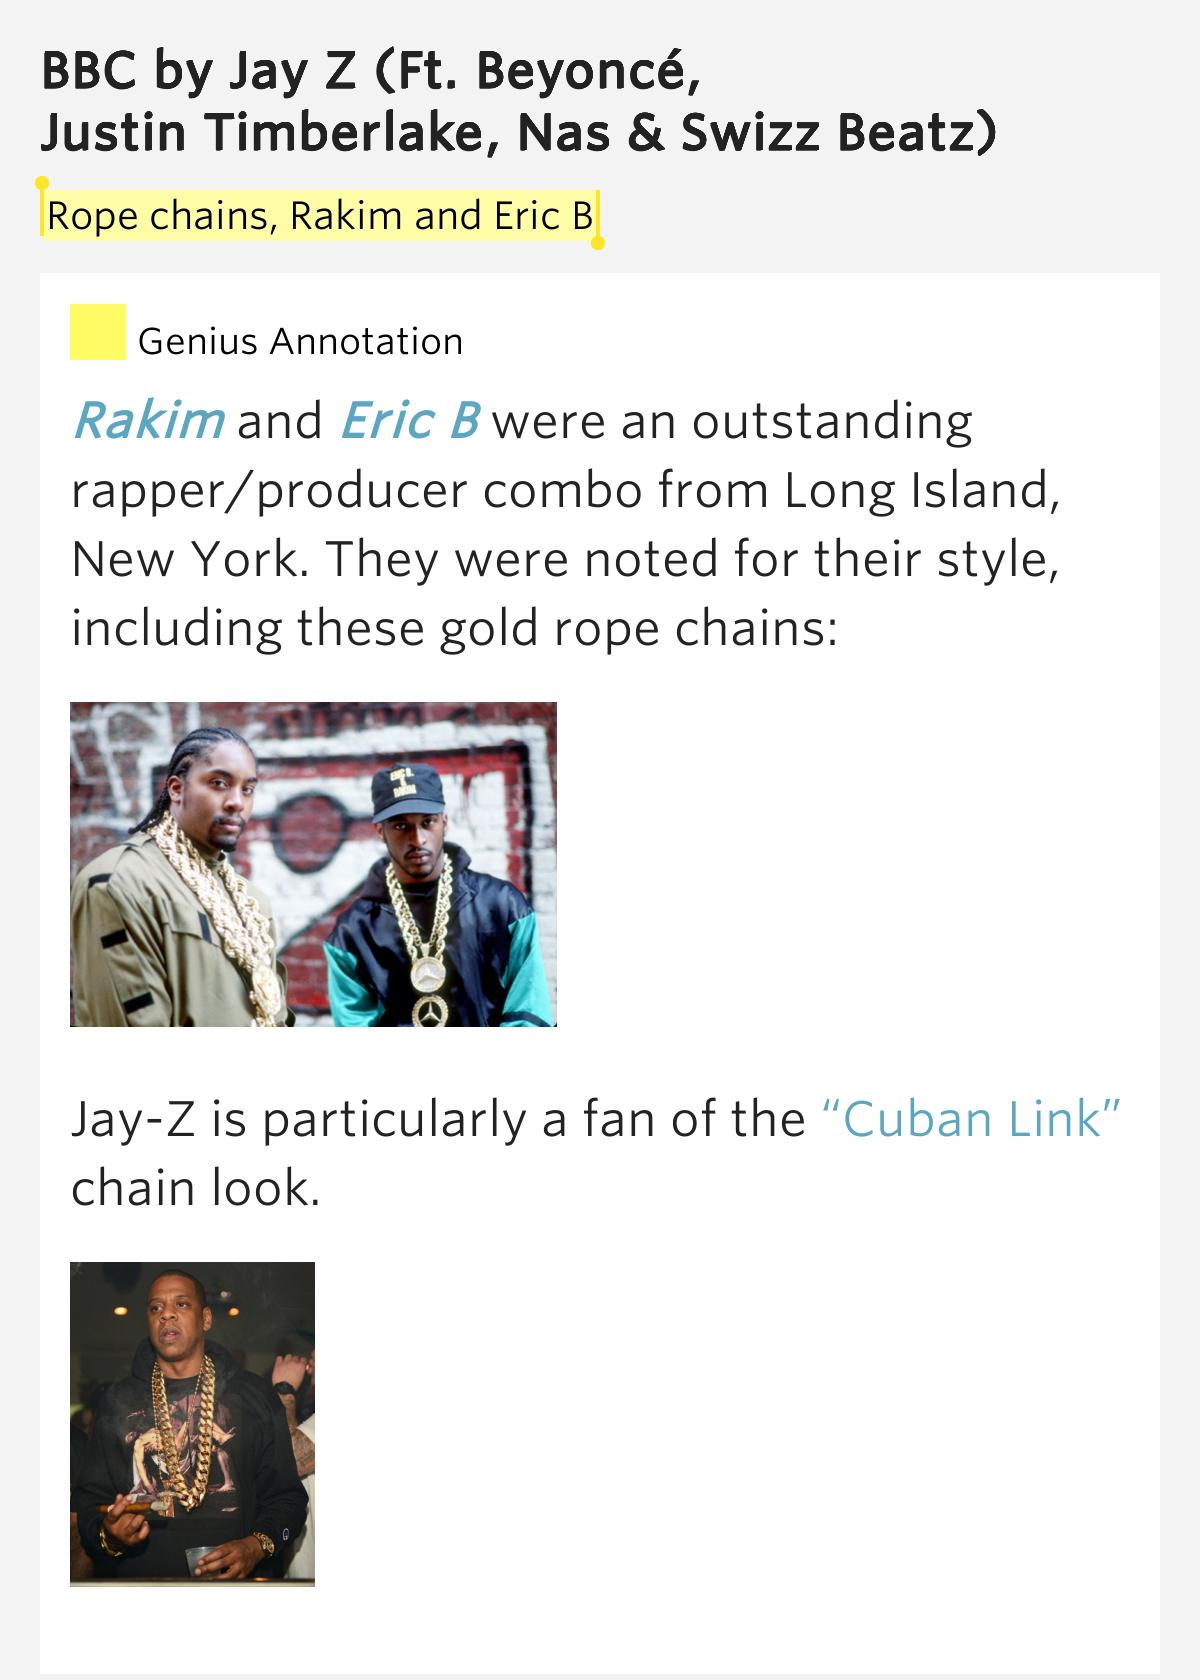 Nick Nolan - Shackles Ropes and Chains Lyrics | Musixmatch